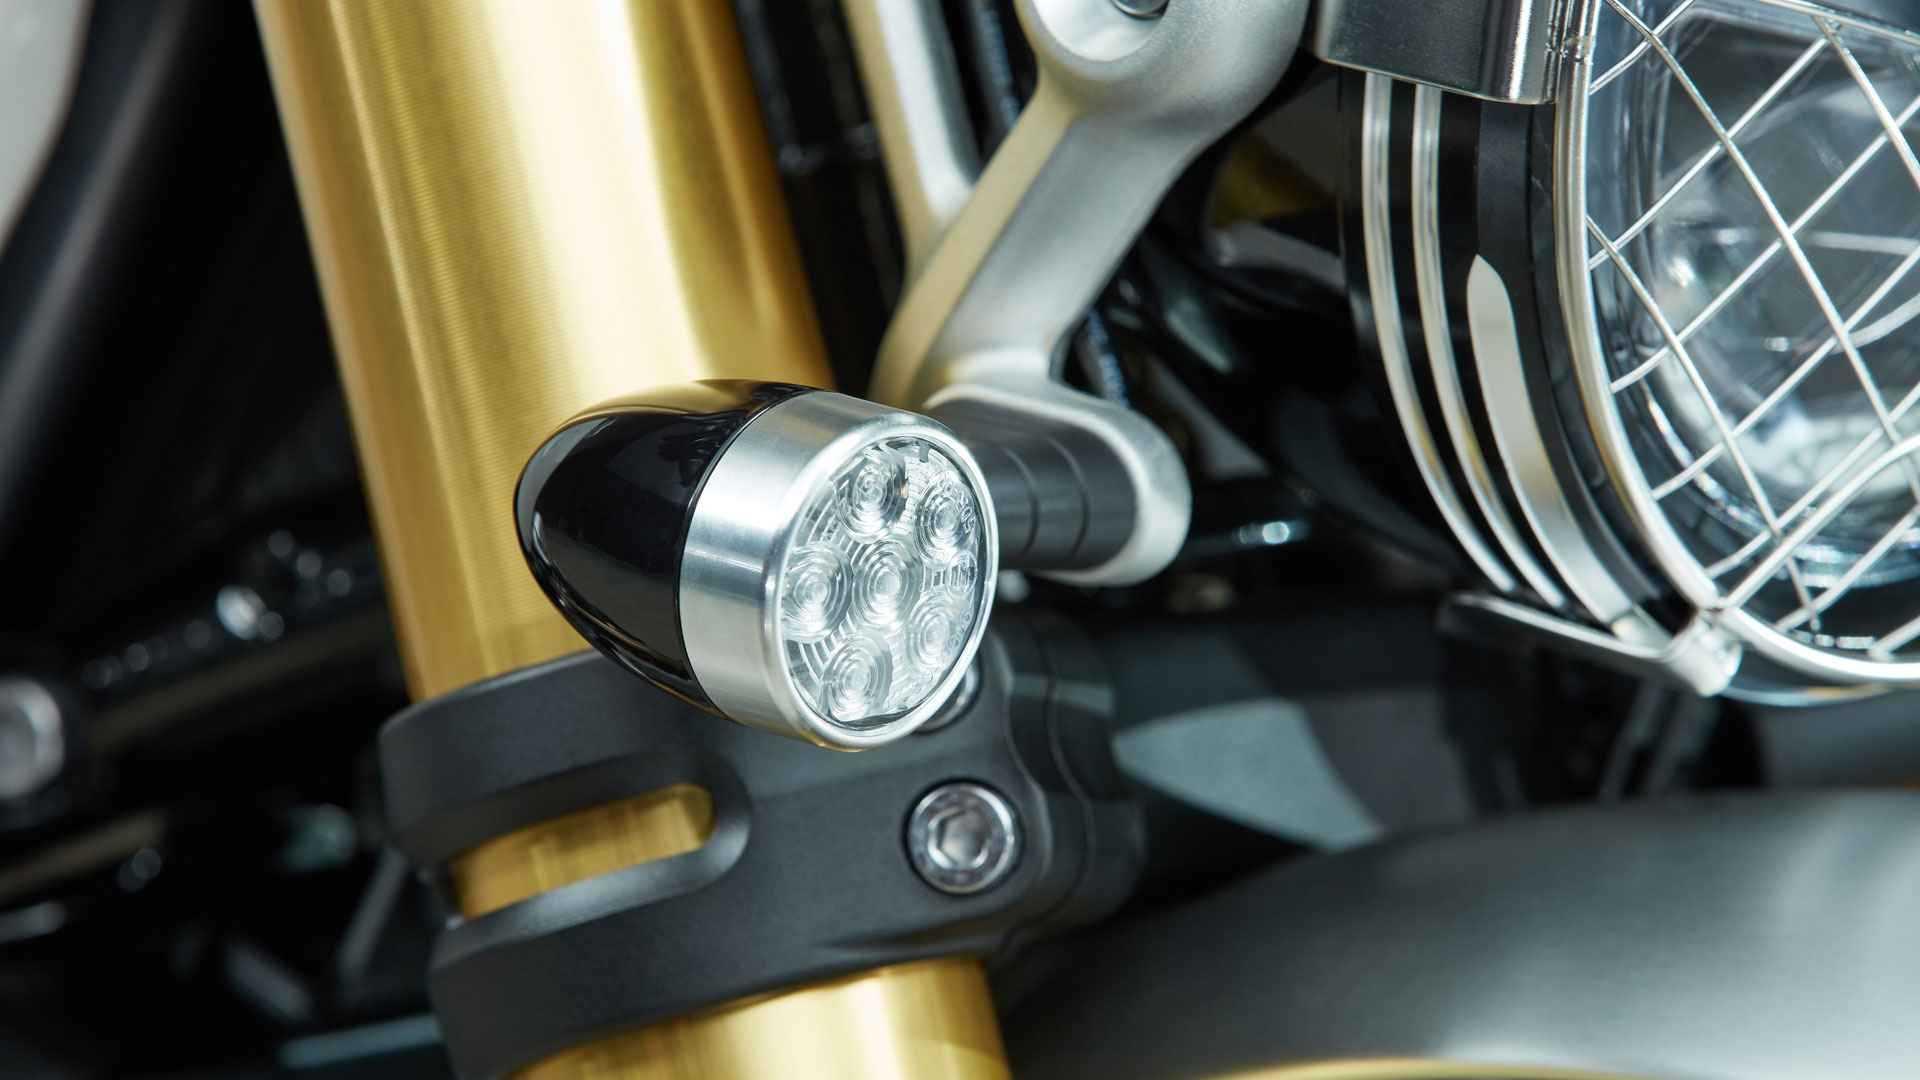 Meet The Triumph Scrambler 1200 XC And XE